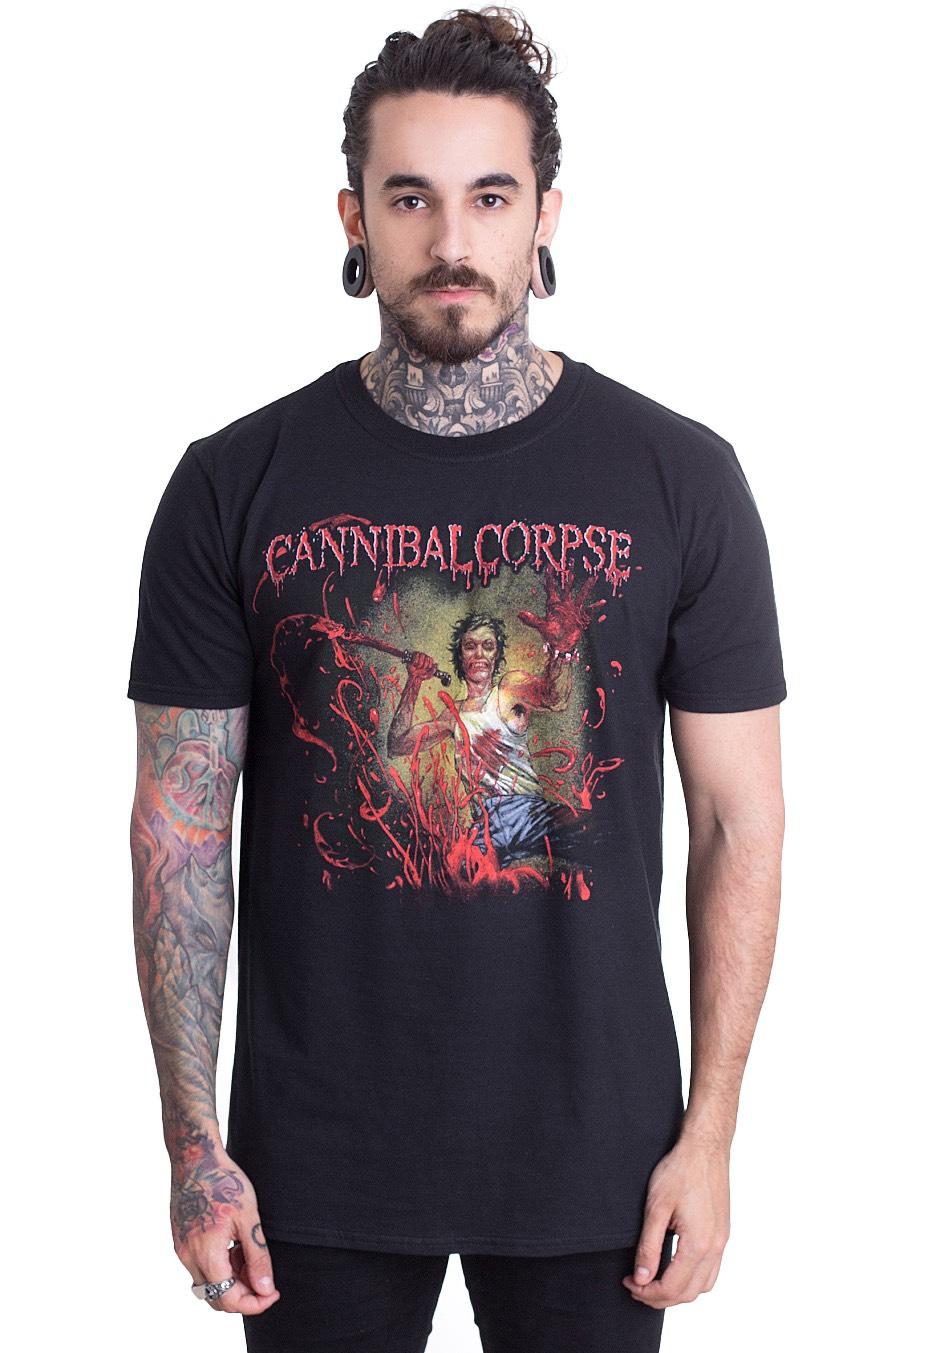 Cannibal Corpse Tour T Shirt